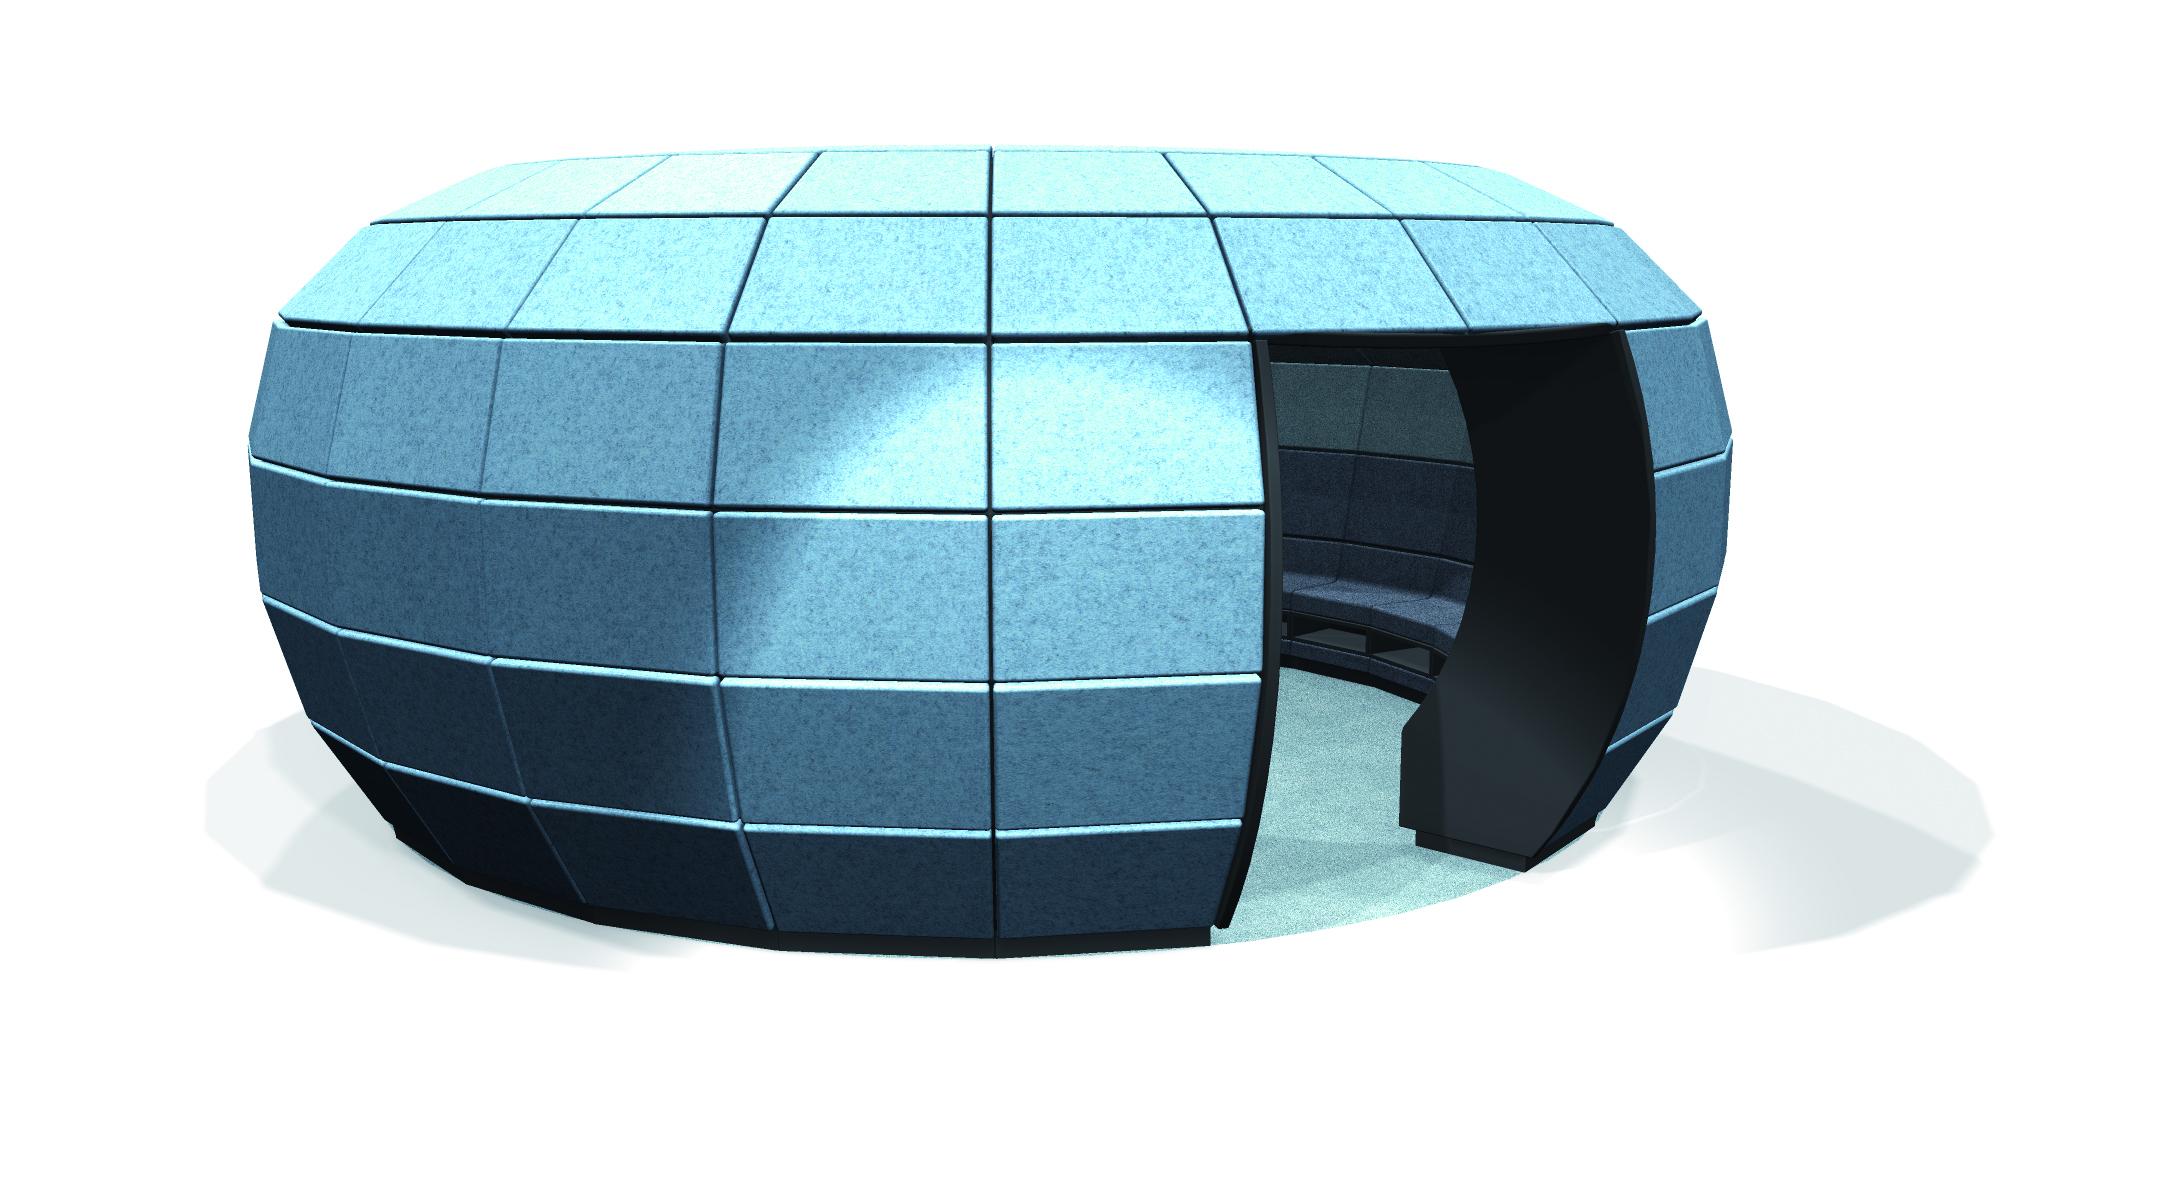 igloo 5.jpg